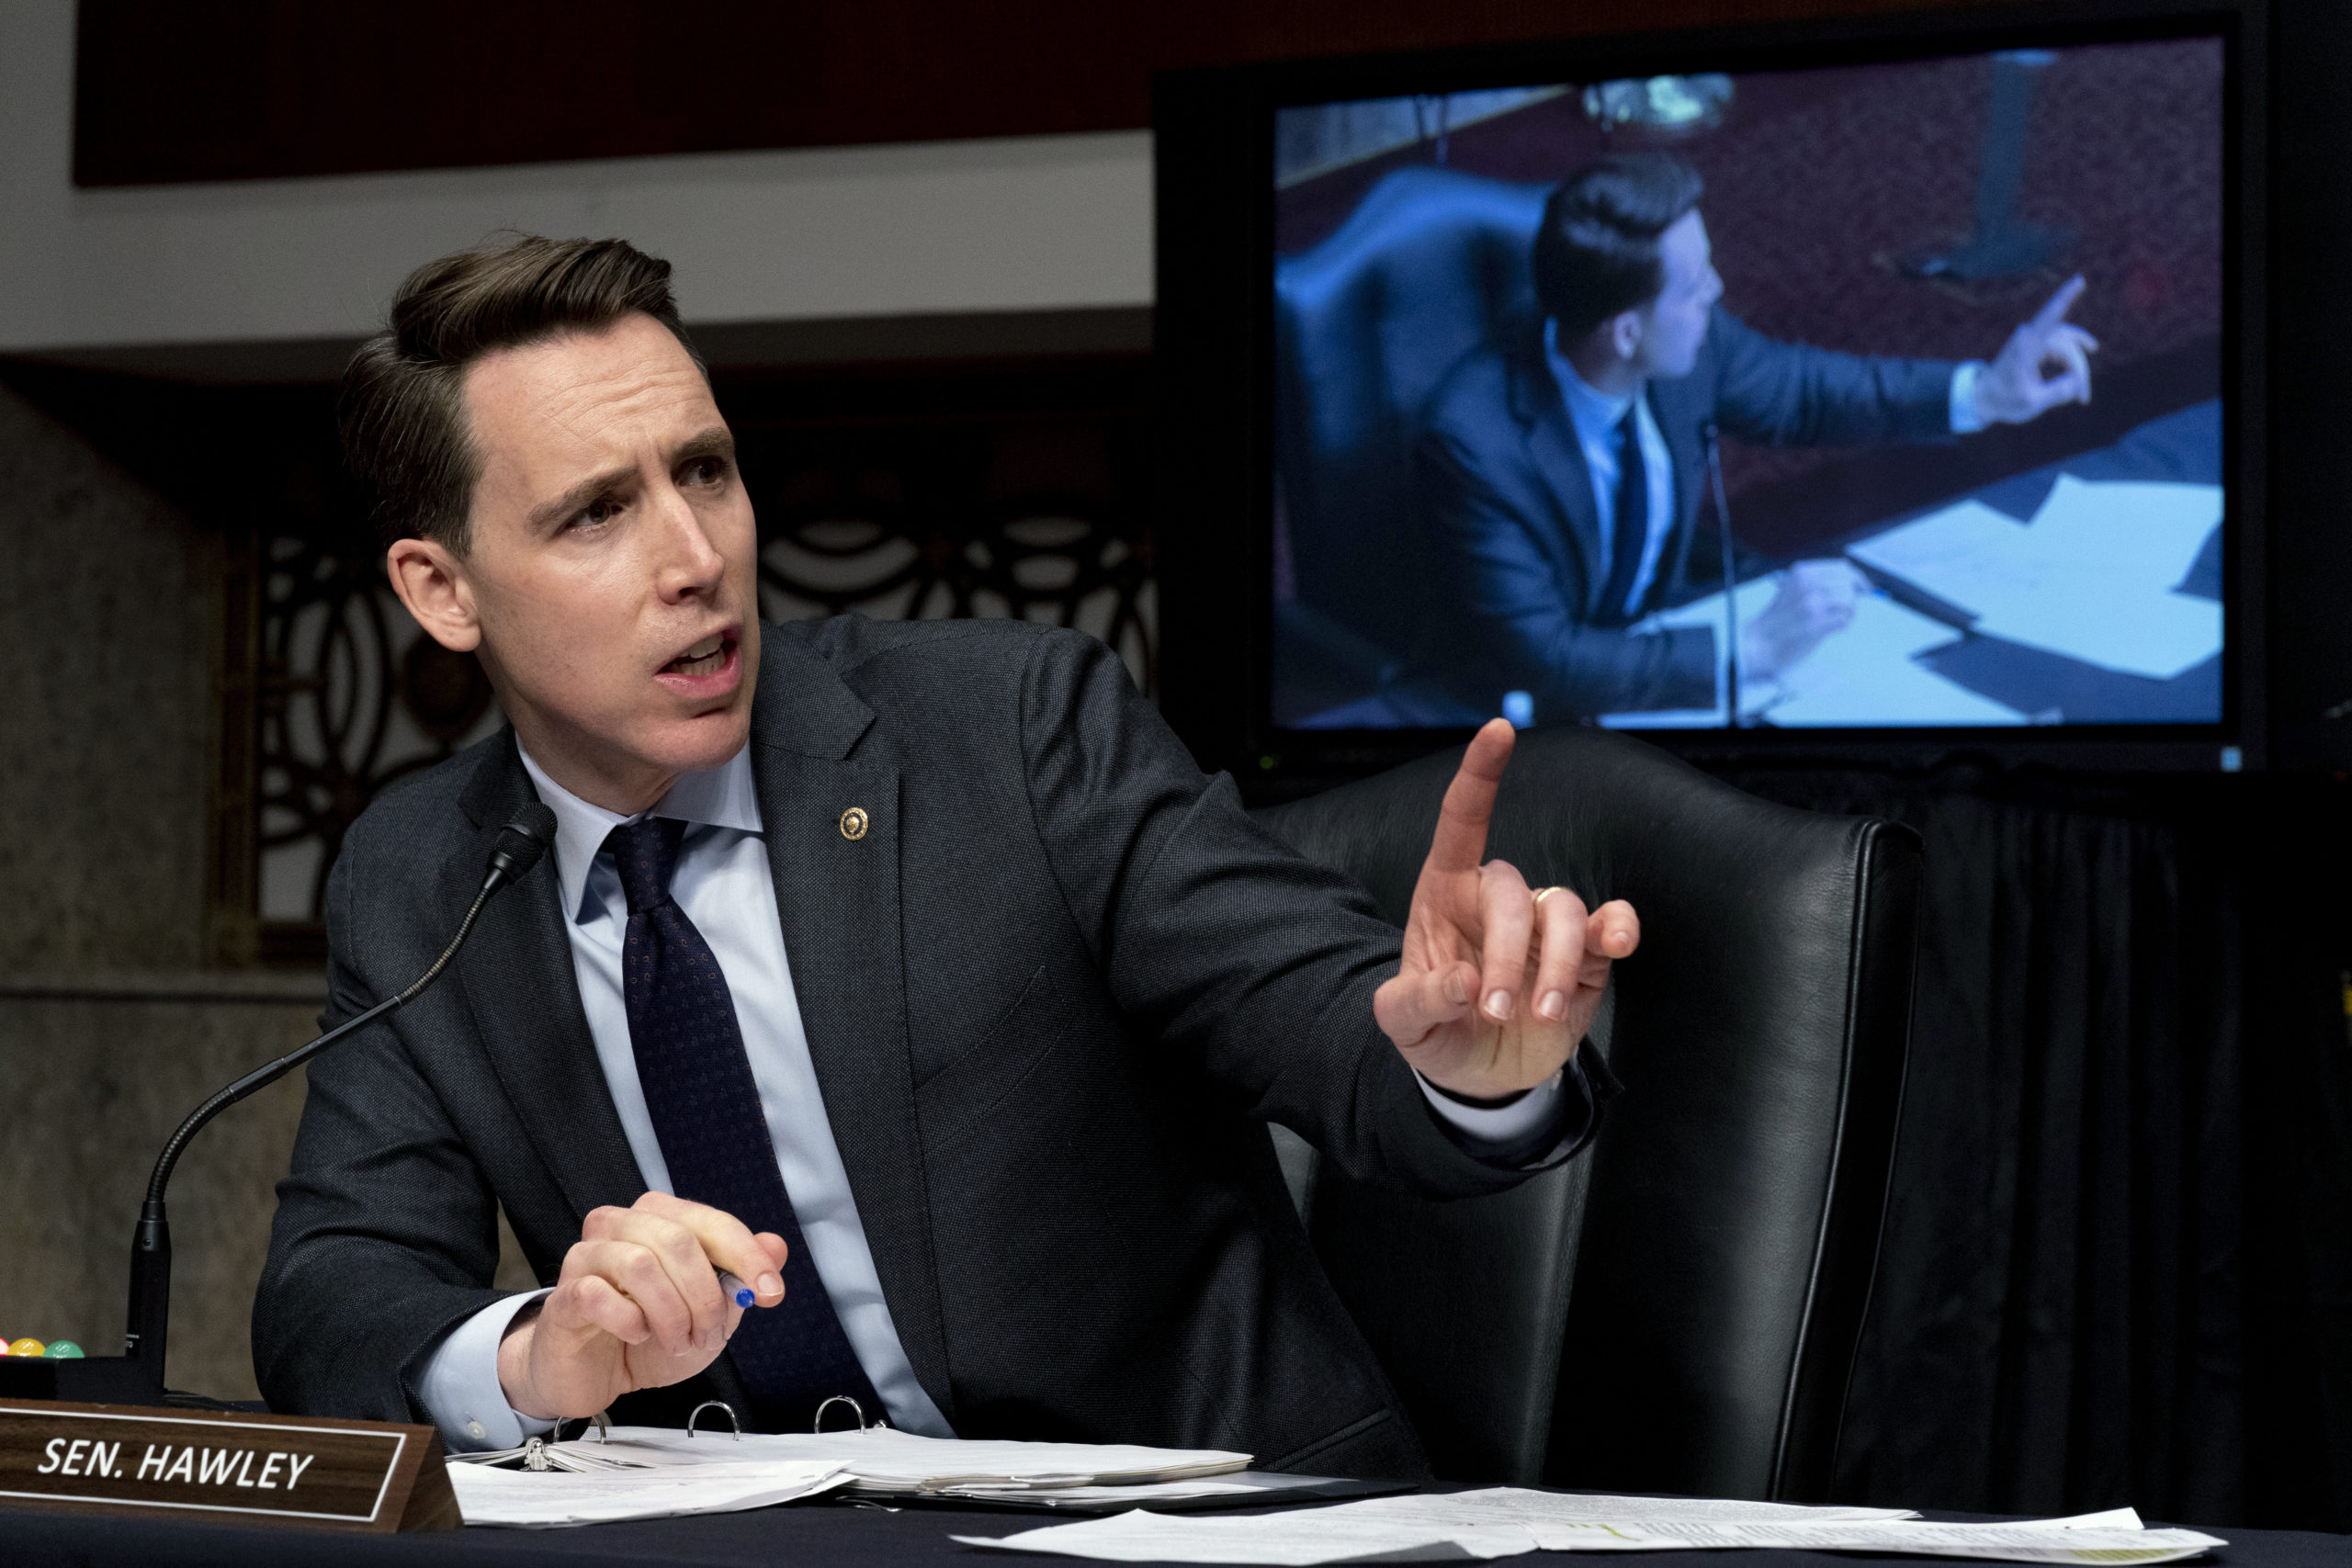 Sen. Josh Hawley speaks during a Senate hearing on Feb. 23. (Andrew Harnik/Pool/Getty Images)